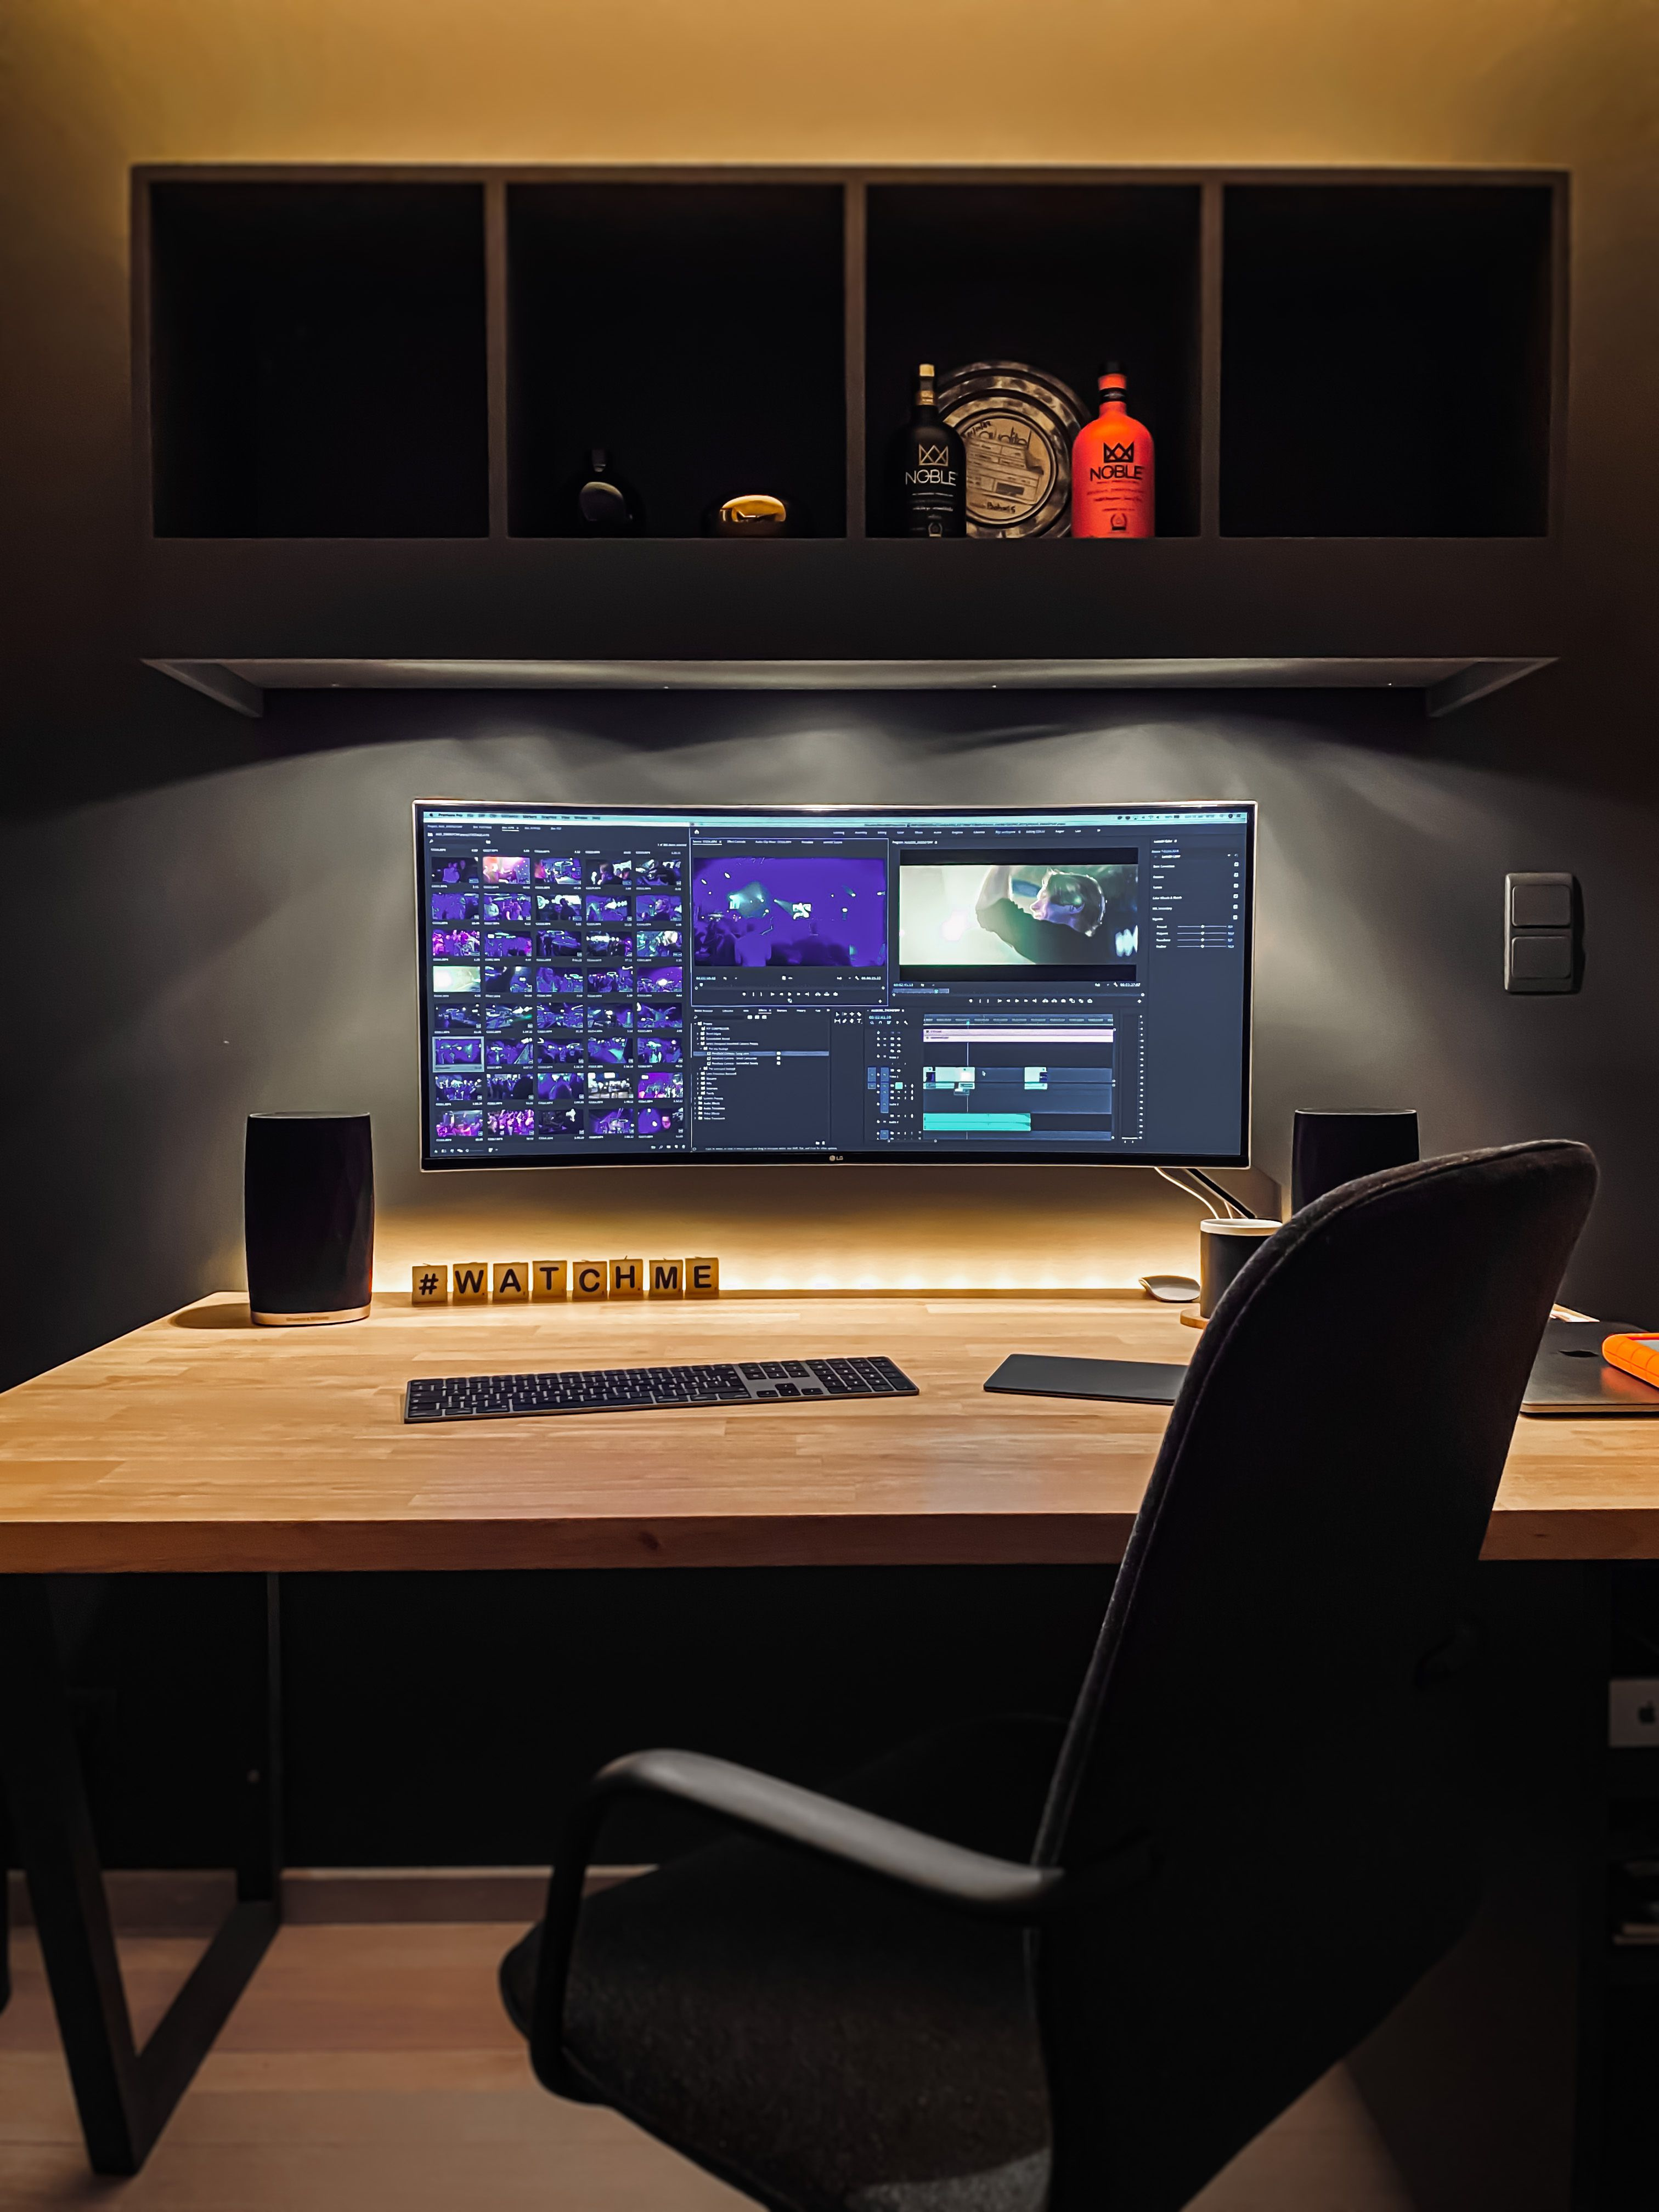 Pin De Matt En Home Office Setup En 2020 Diseno De Espacio De Trabajo Escritorio De Estudio Diseno De Espacios